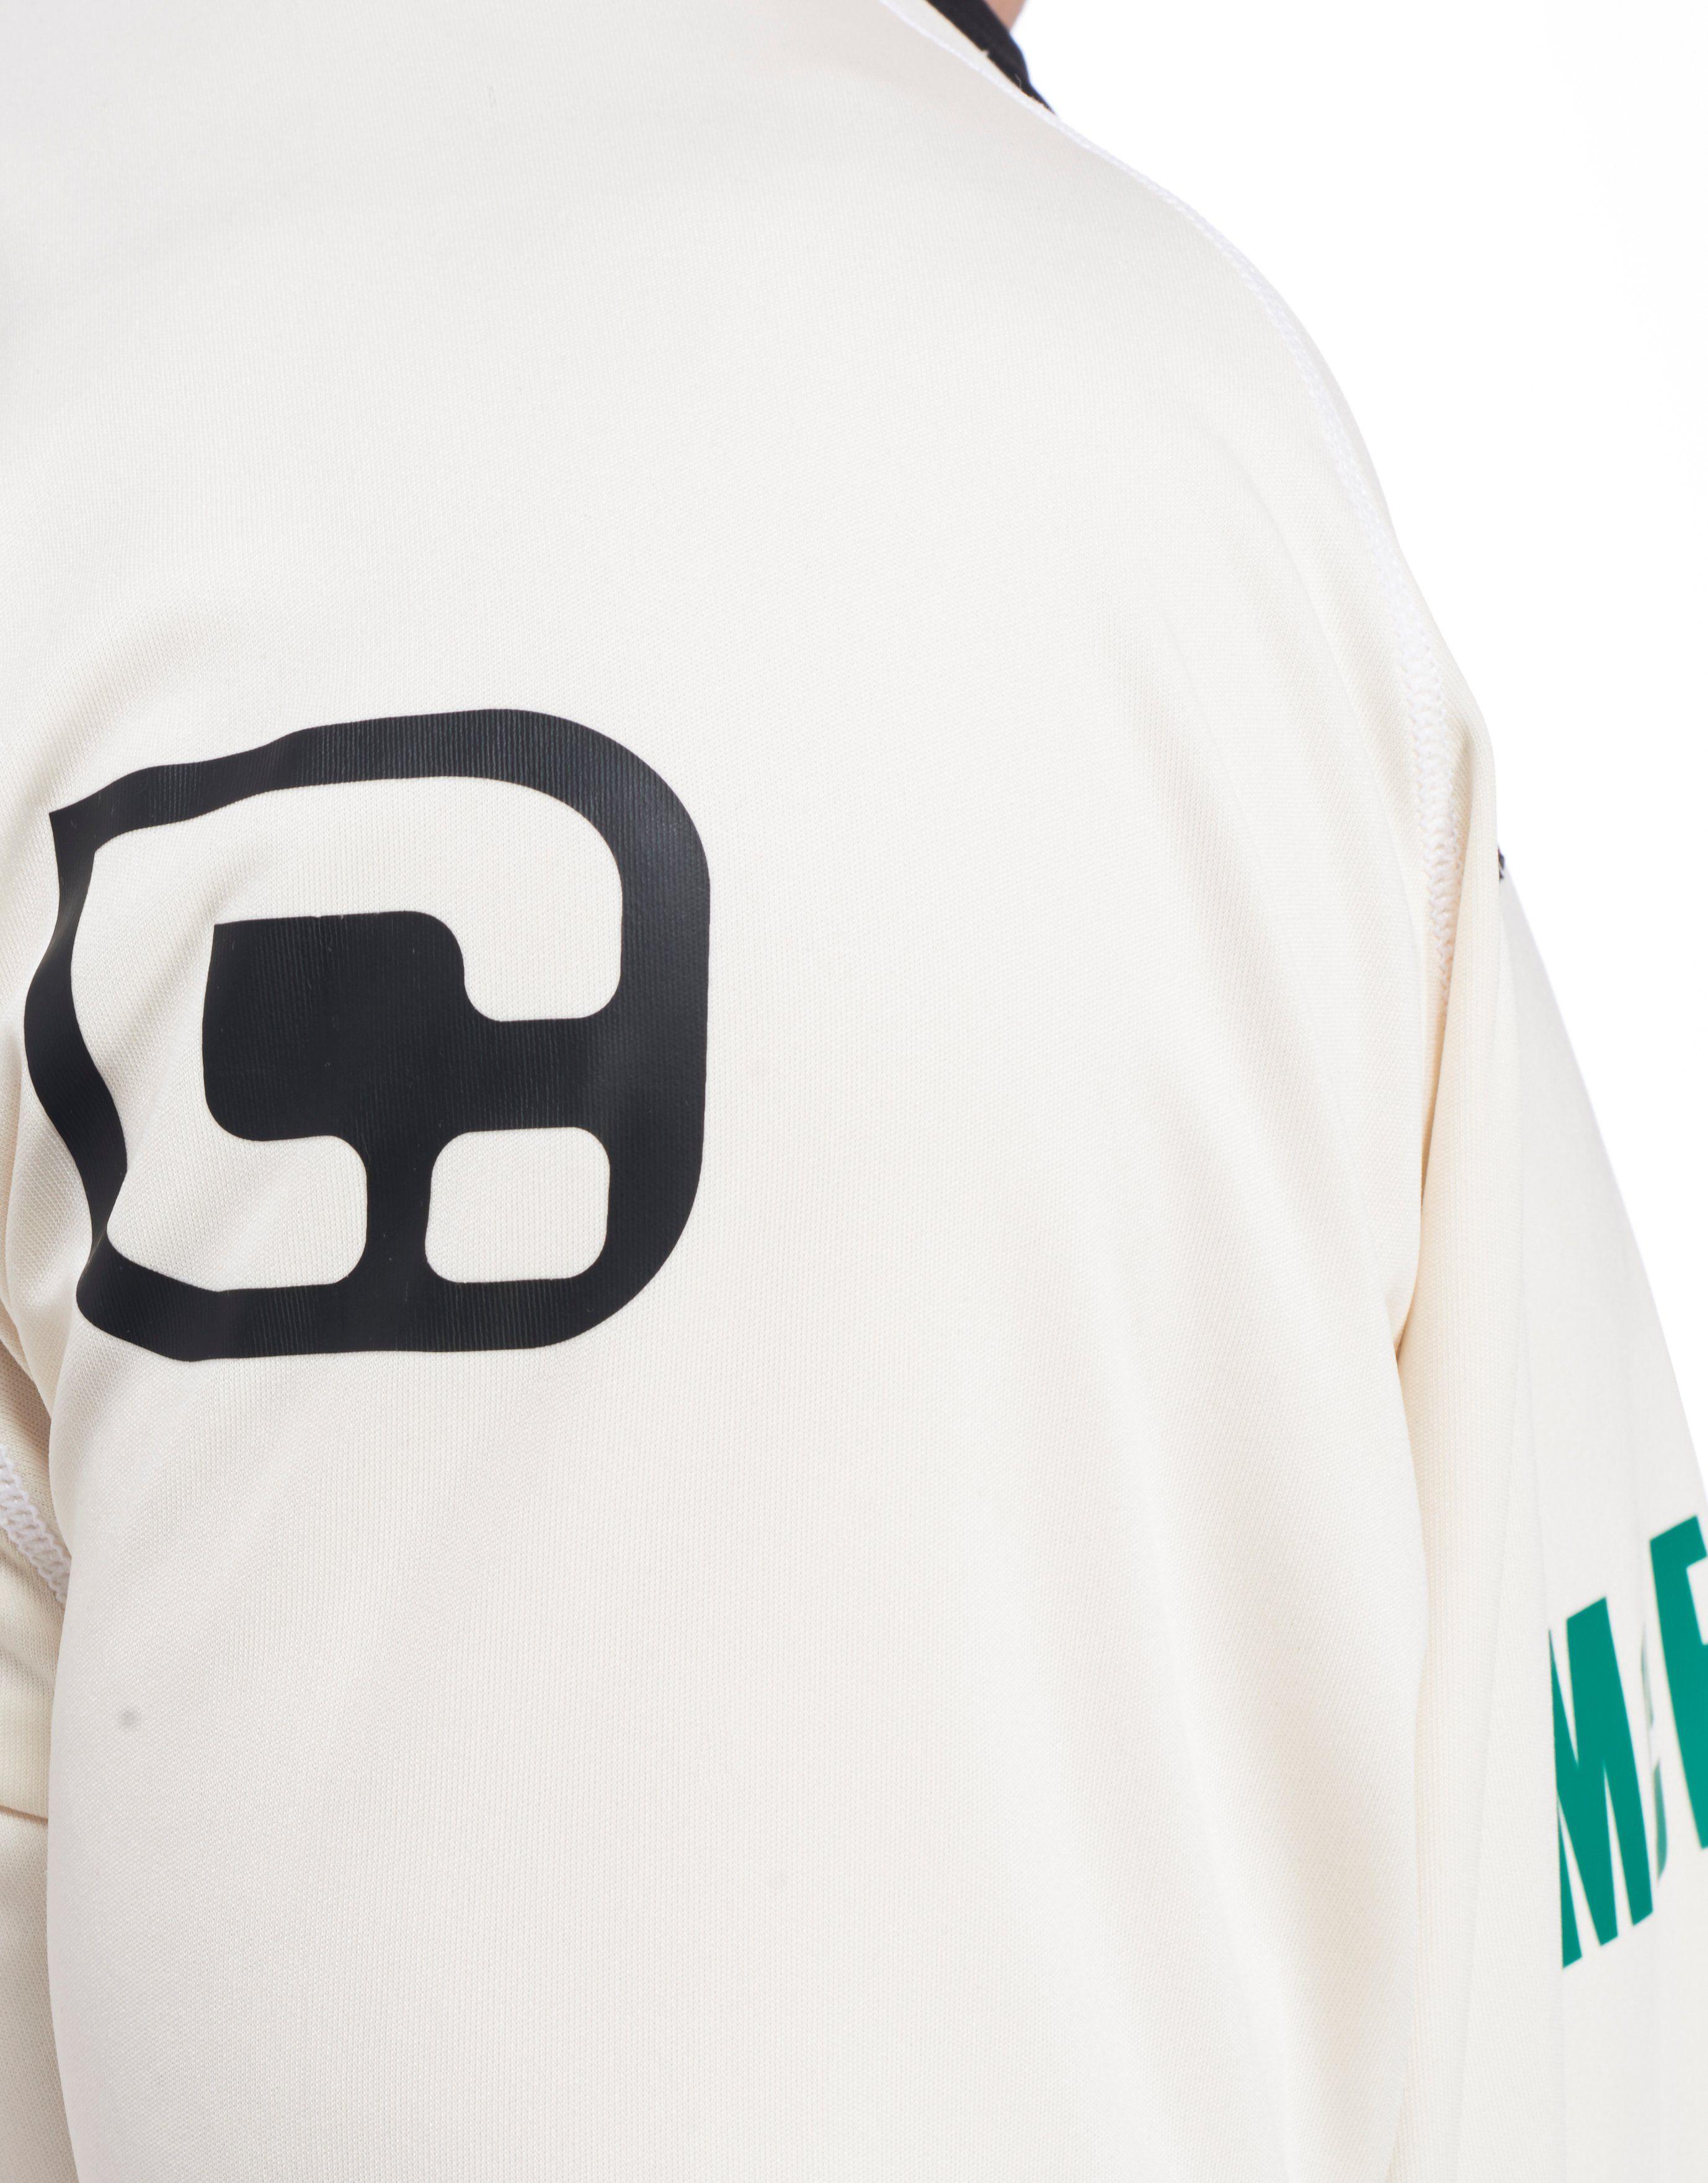 Carbrini Inverness CT 2016/17 Away Shirt